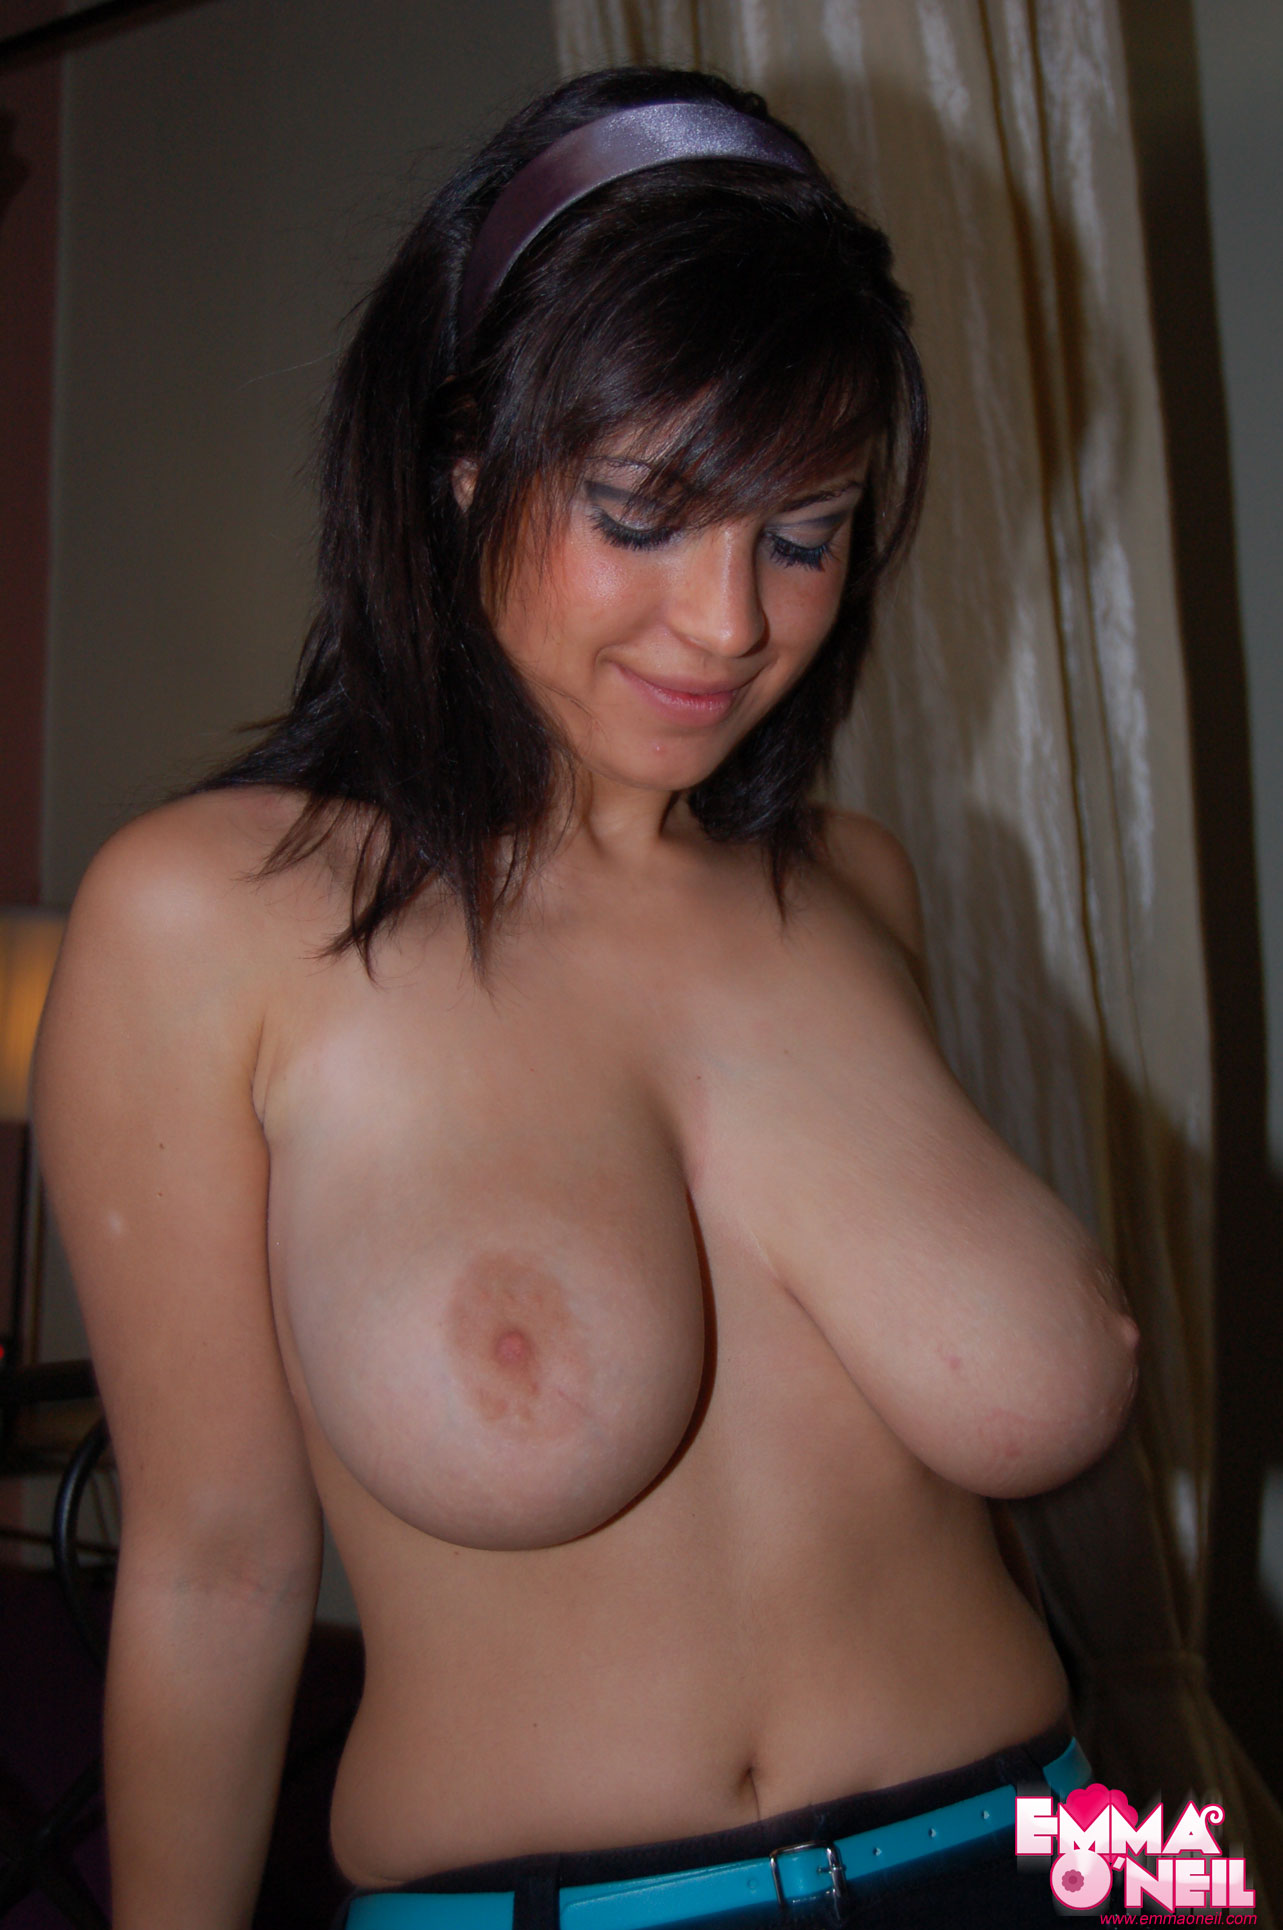 Emma Oneil Nude